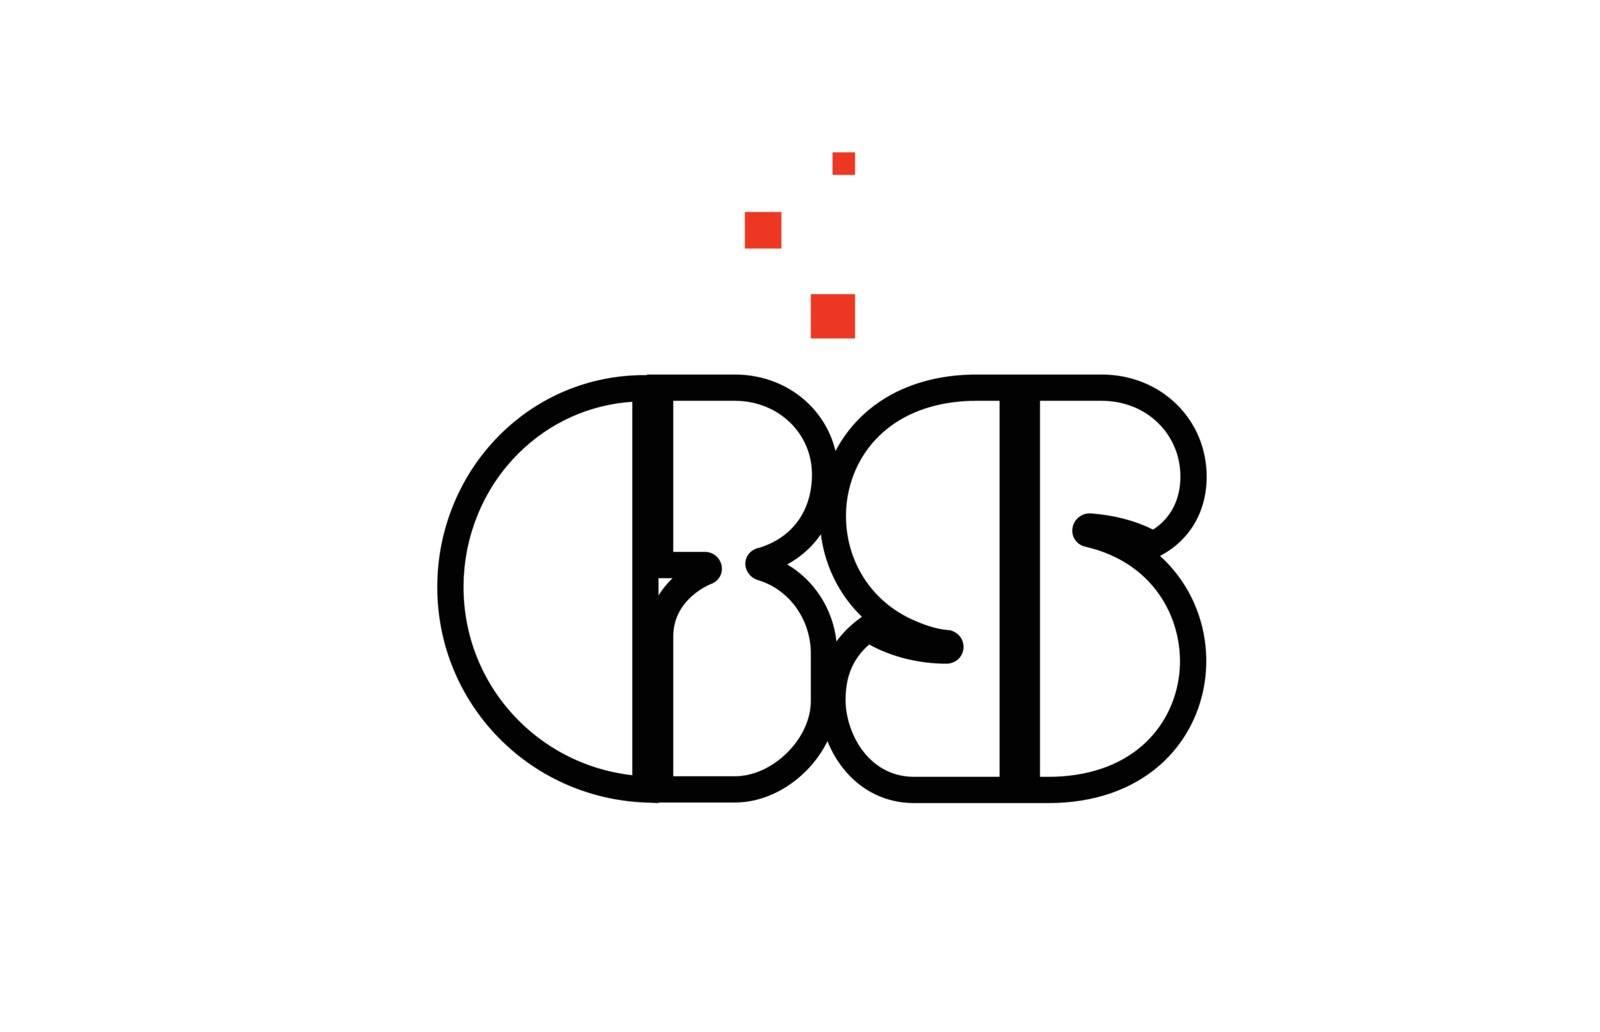 GS G S black white red alphabet letter combination logo icon des by dragomirescu